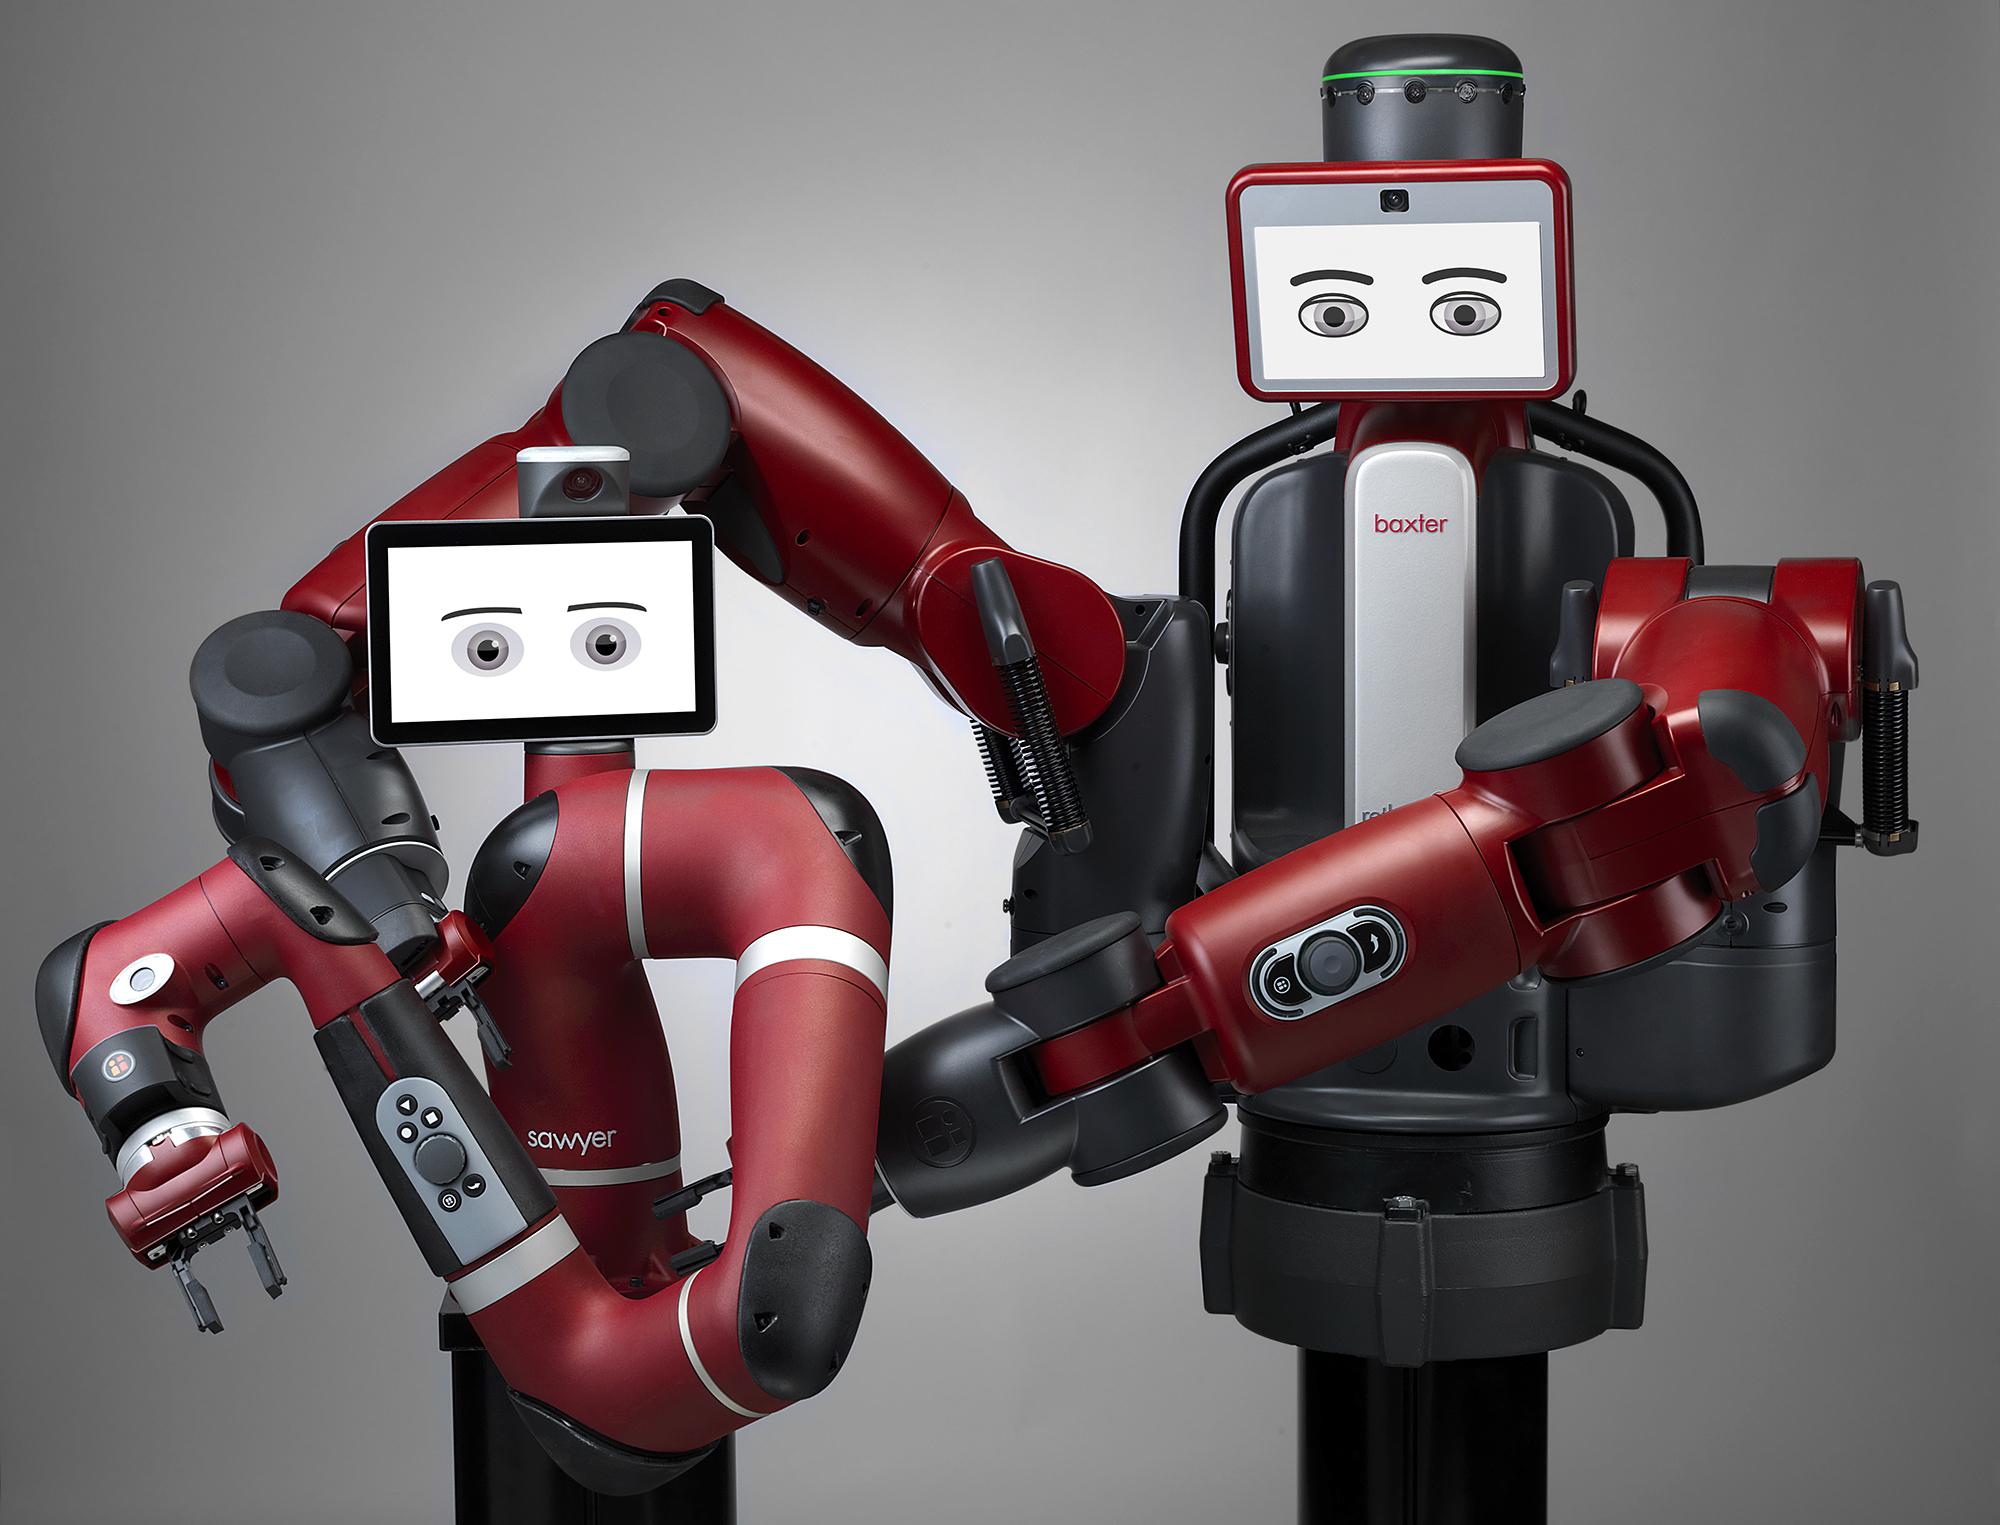 PTC将在2017年LiveWorx大会举办商用机器人专题研究